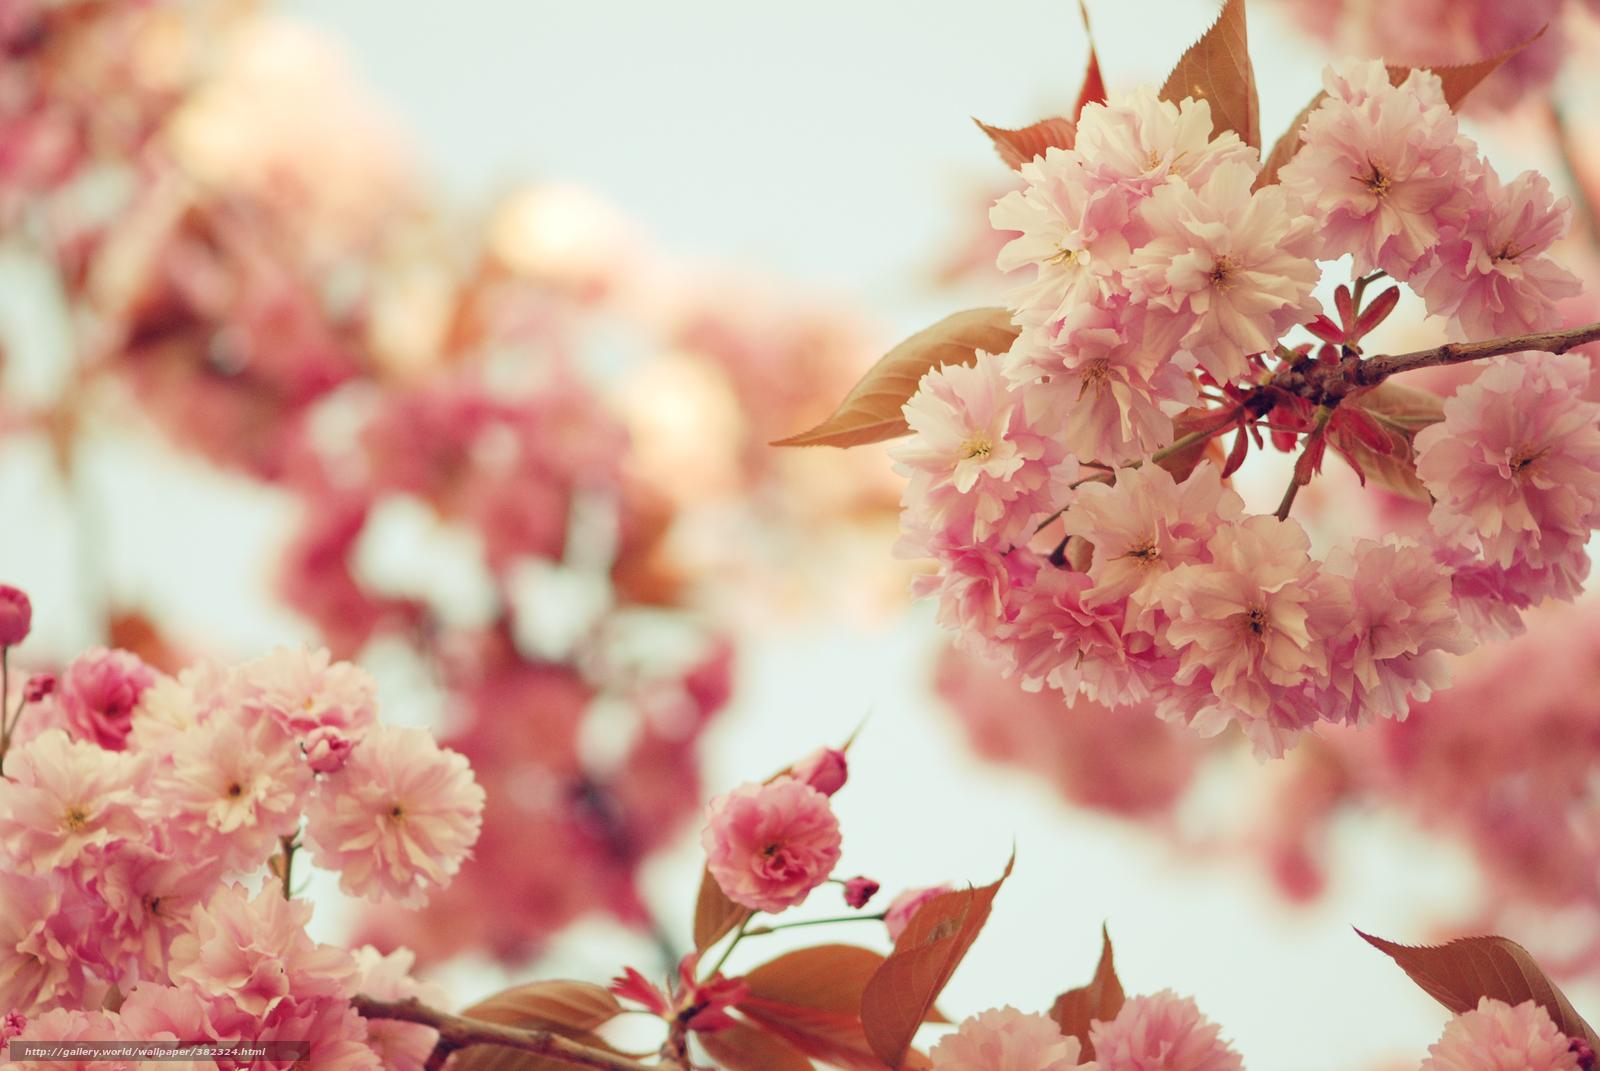 download hintergrund sakura blumen rosa bltenbltter. Black Bedroom Furniture Sets. Home Design Ideas